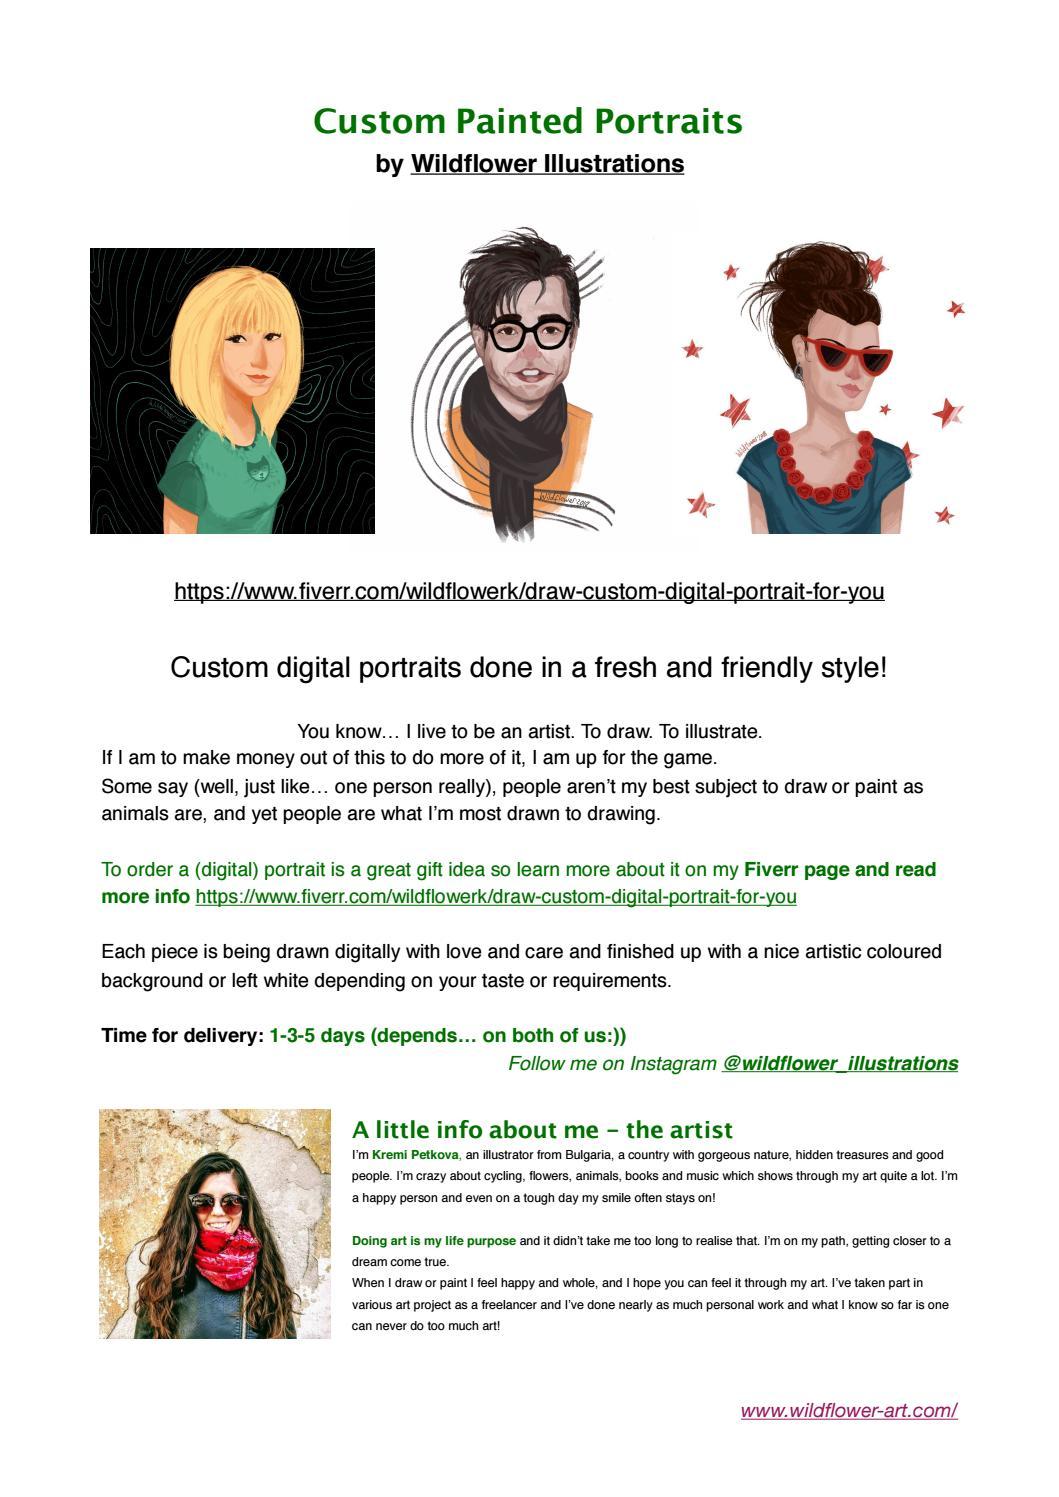 Digital portrait 1-3 people